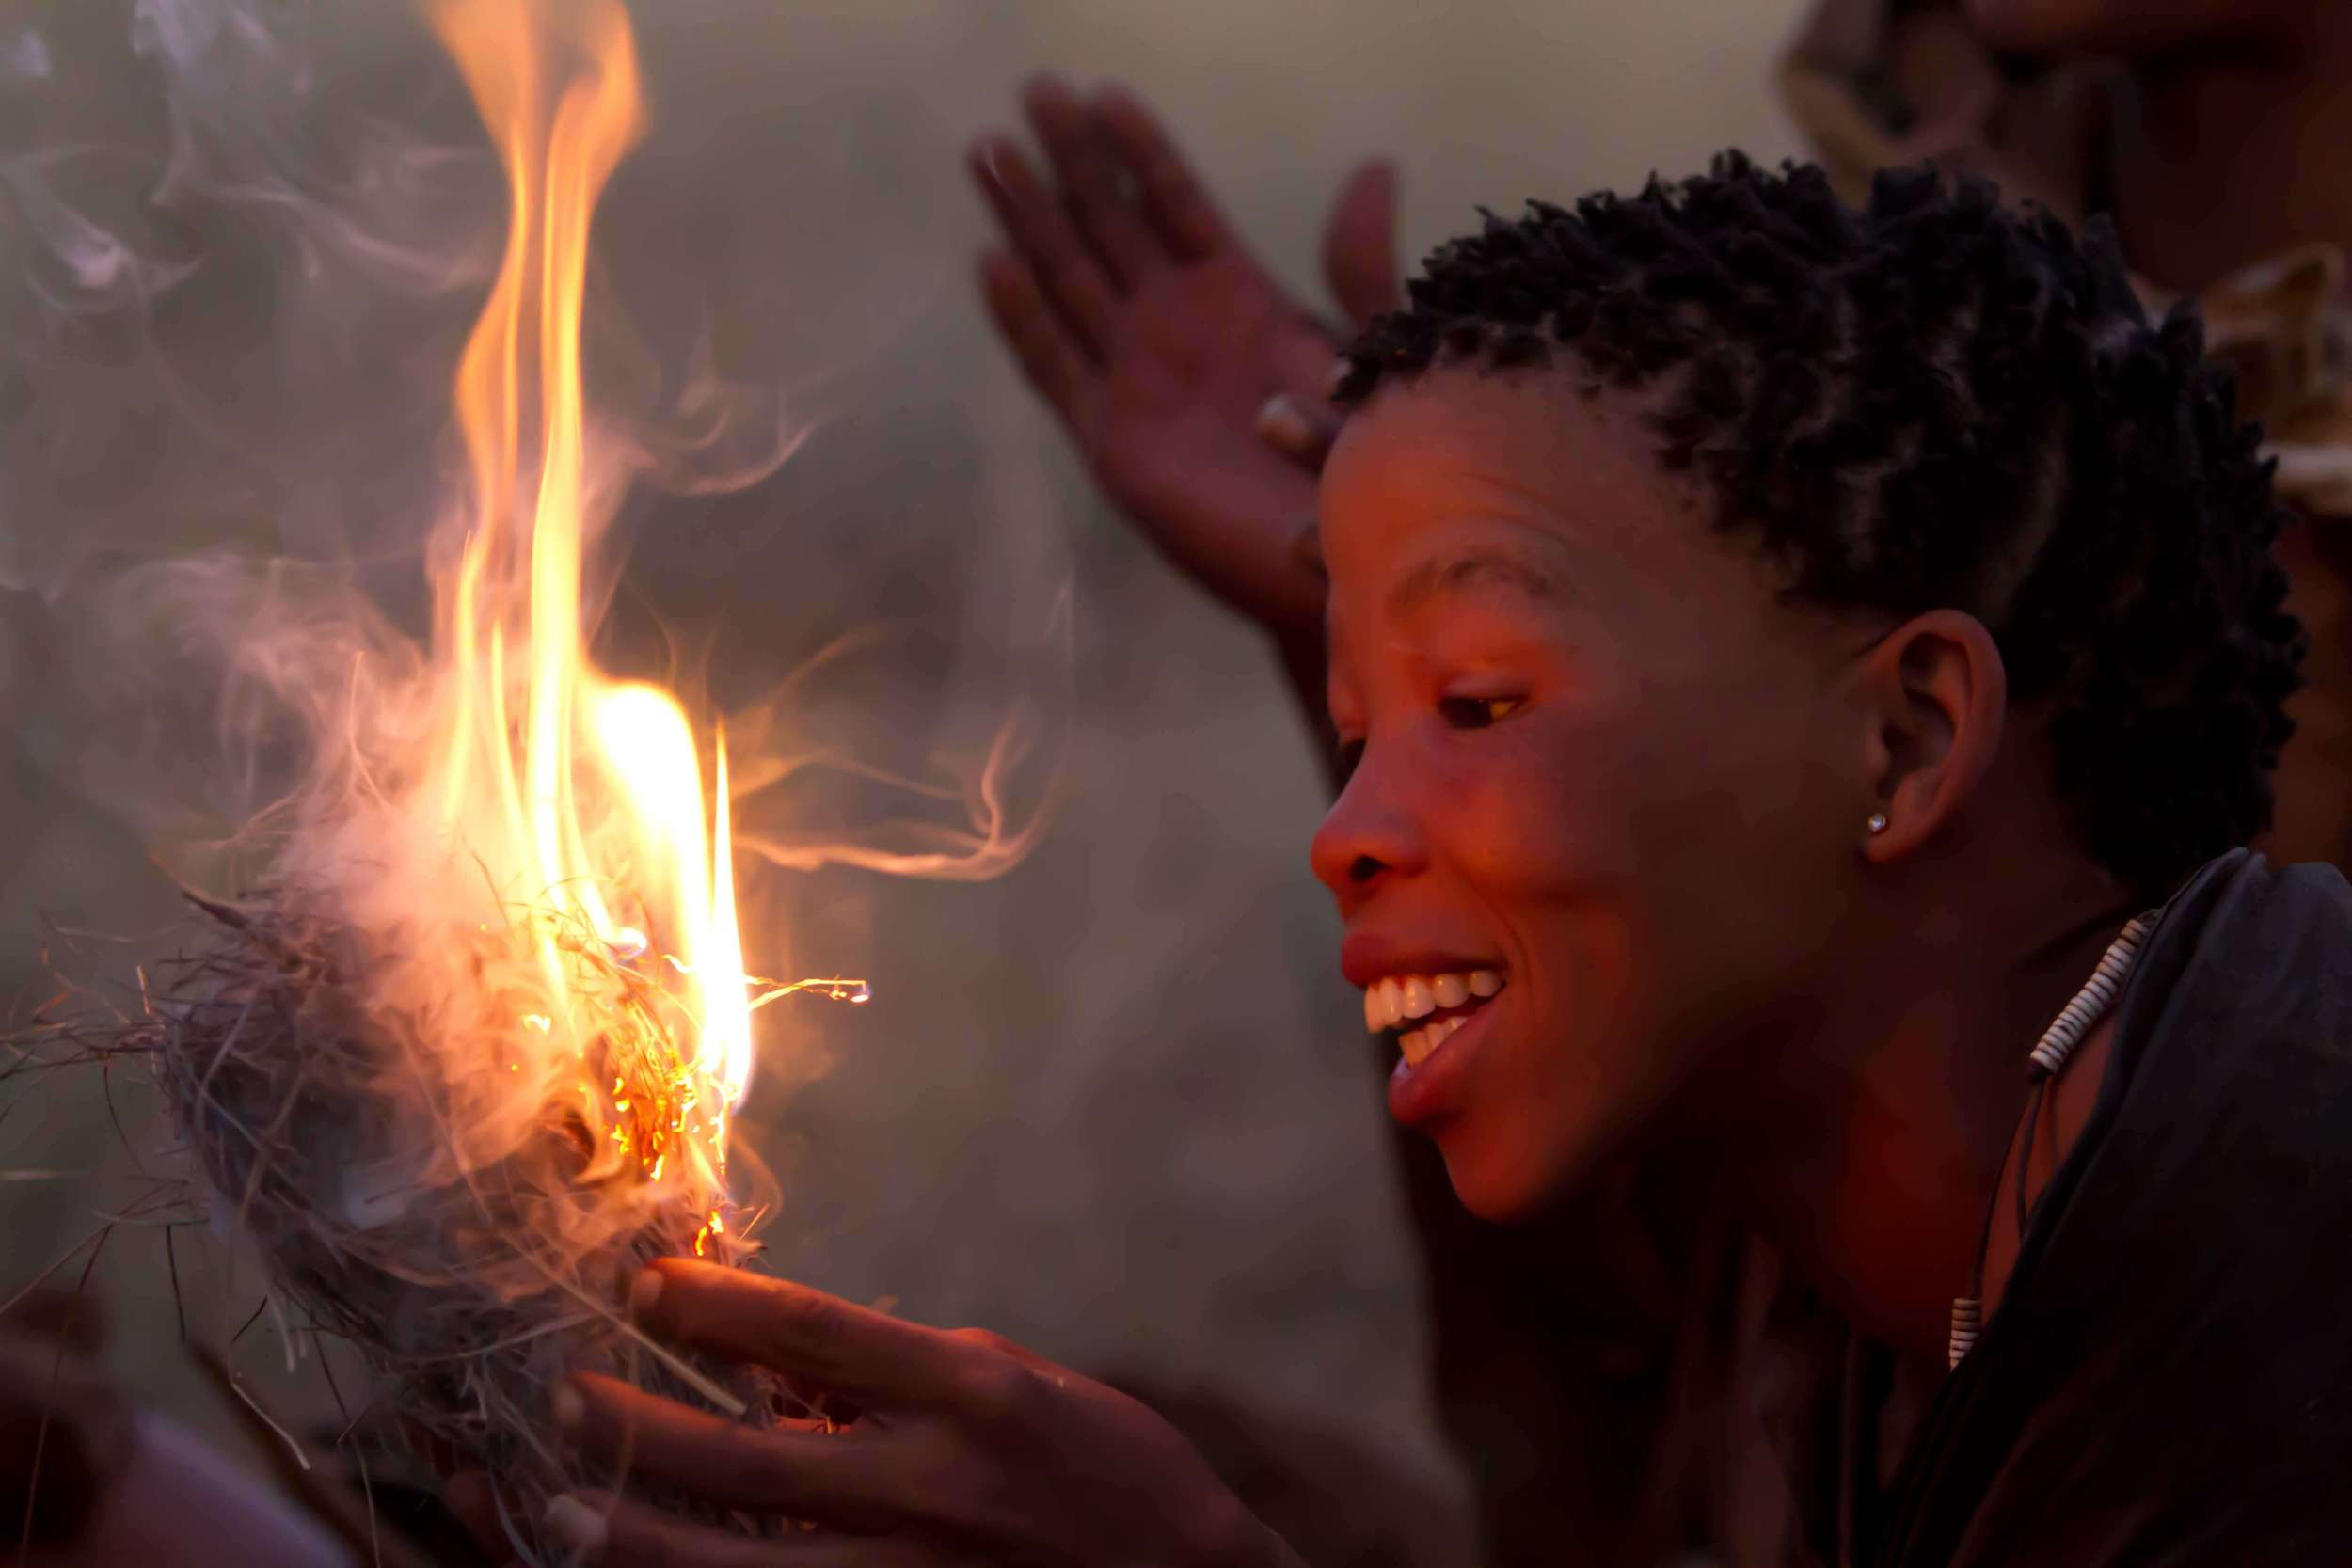 Top  ©: David Coulson & the Trust for African Rock Art;  Bottom  © Dr Flash/Shutterstock.